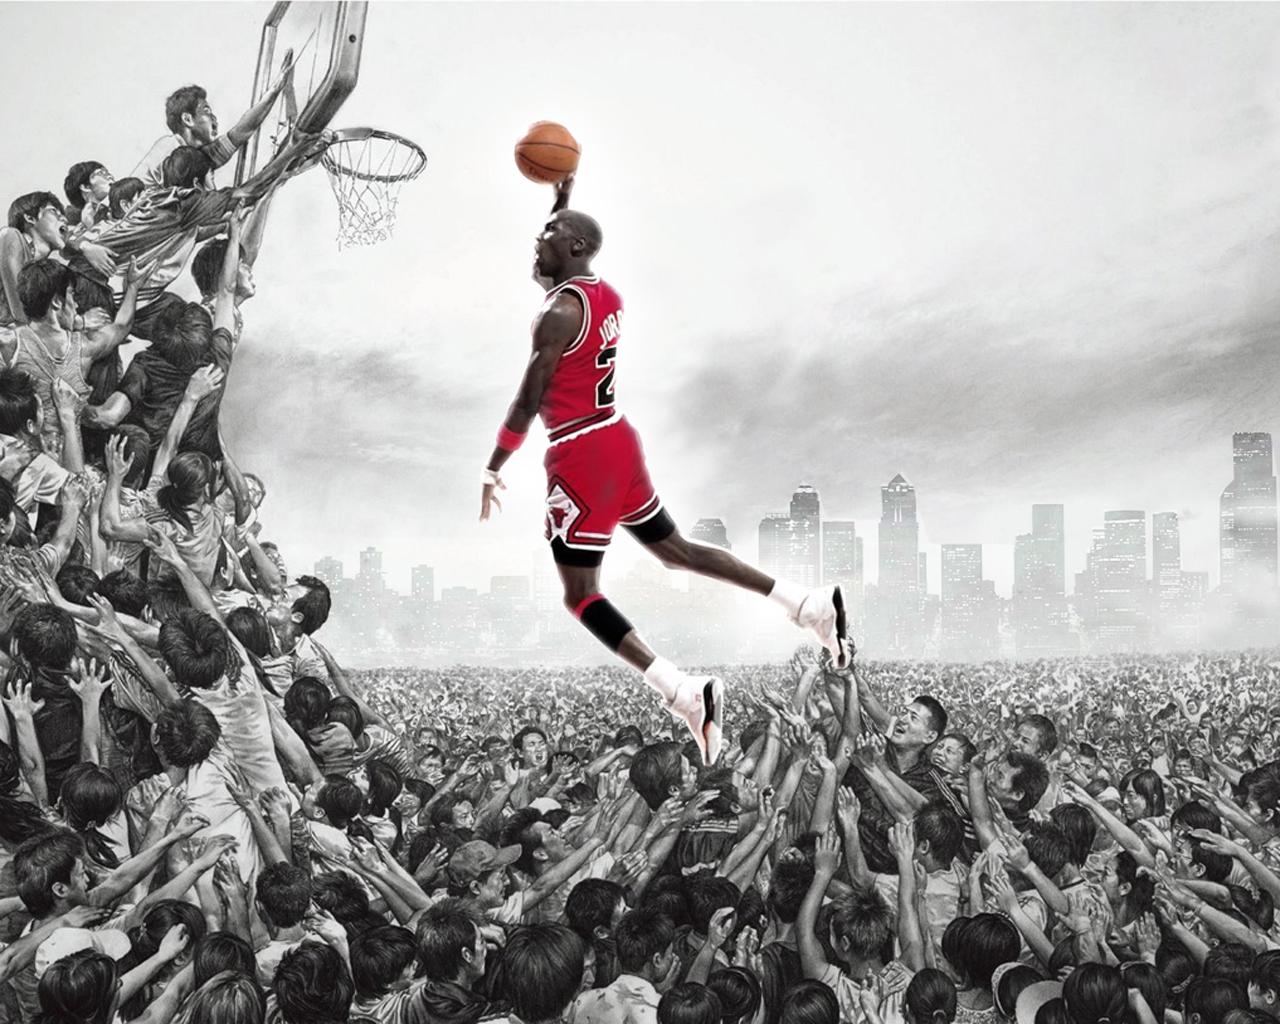 Xc 4 Basketball Wallpapers Michael Jordan